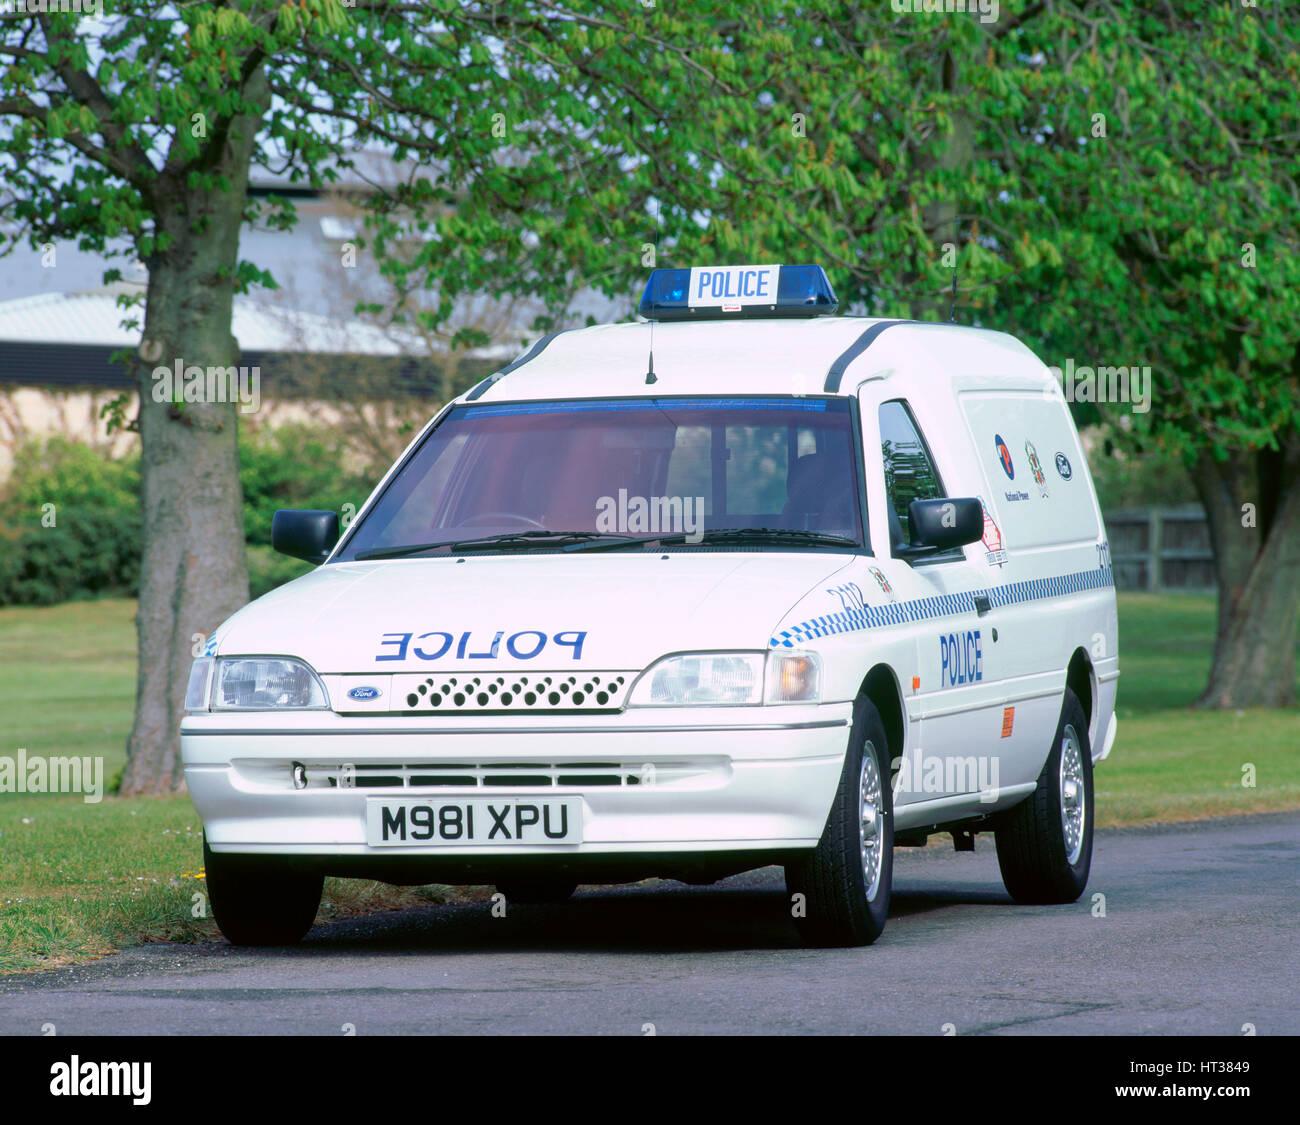 1995 Ford Escort Ecostar Electric Police Van Artist Unknown